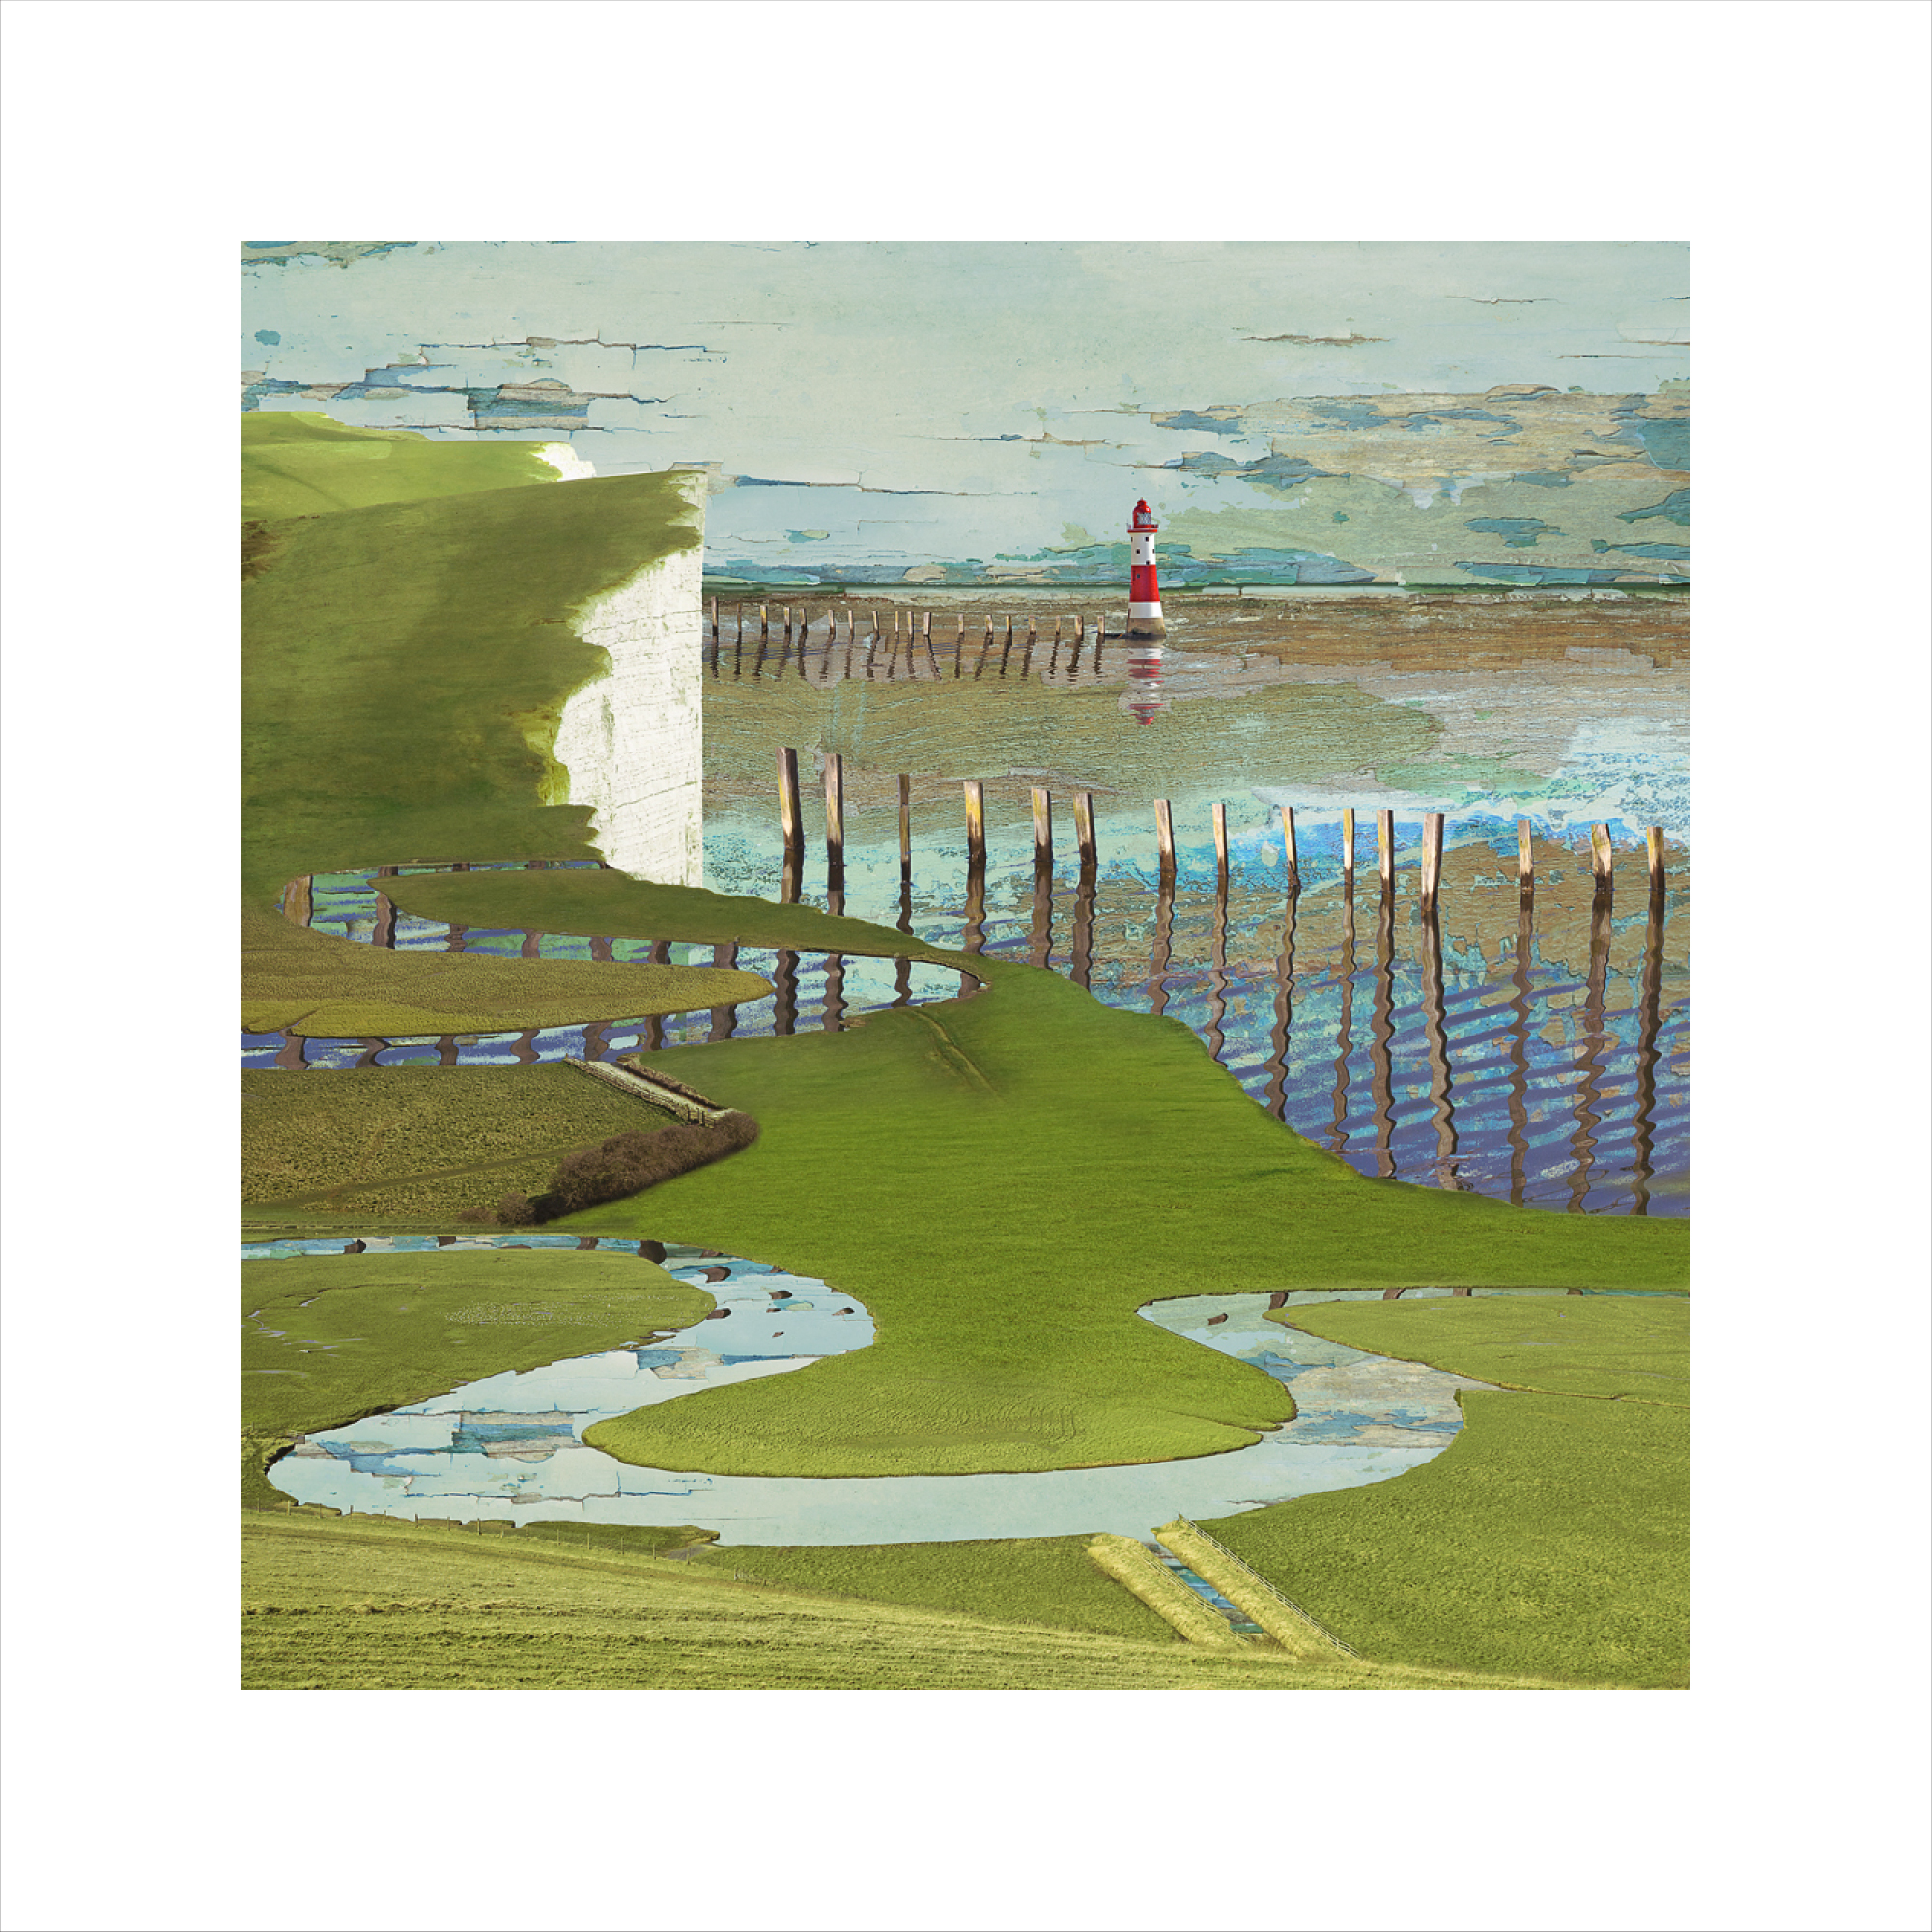 Claire Gill, Limited edition prints, digital photomontage, fine art prints, hahnemuhle, coastal art, Collect Art, seascape 45, Cuckmere, Birling Gap, Eastbourne, Lighthouse